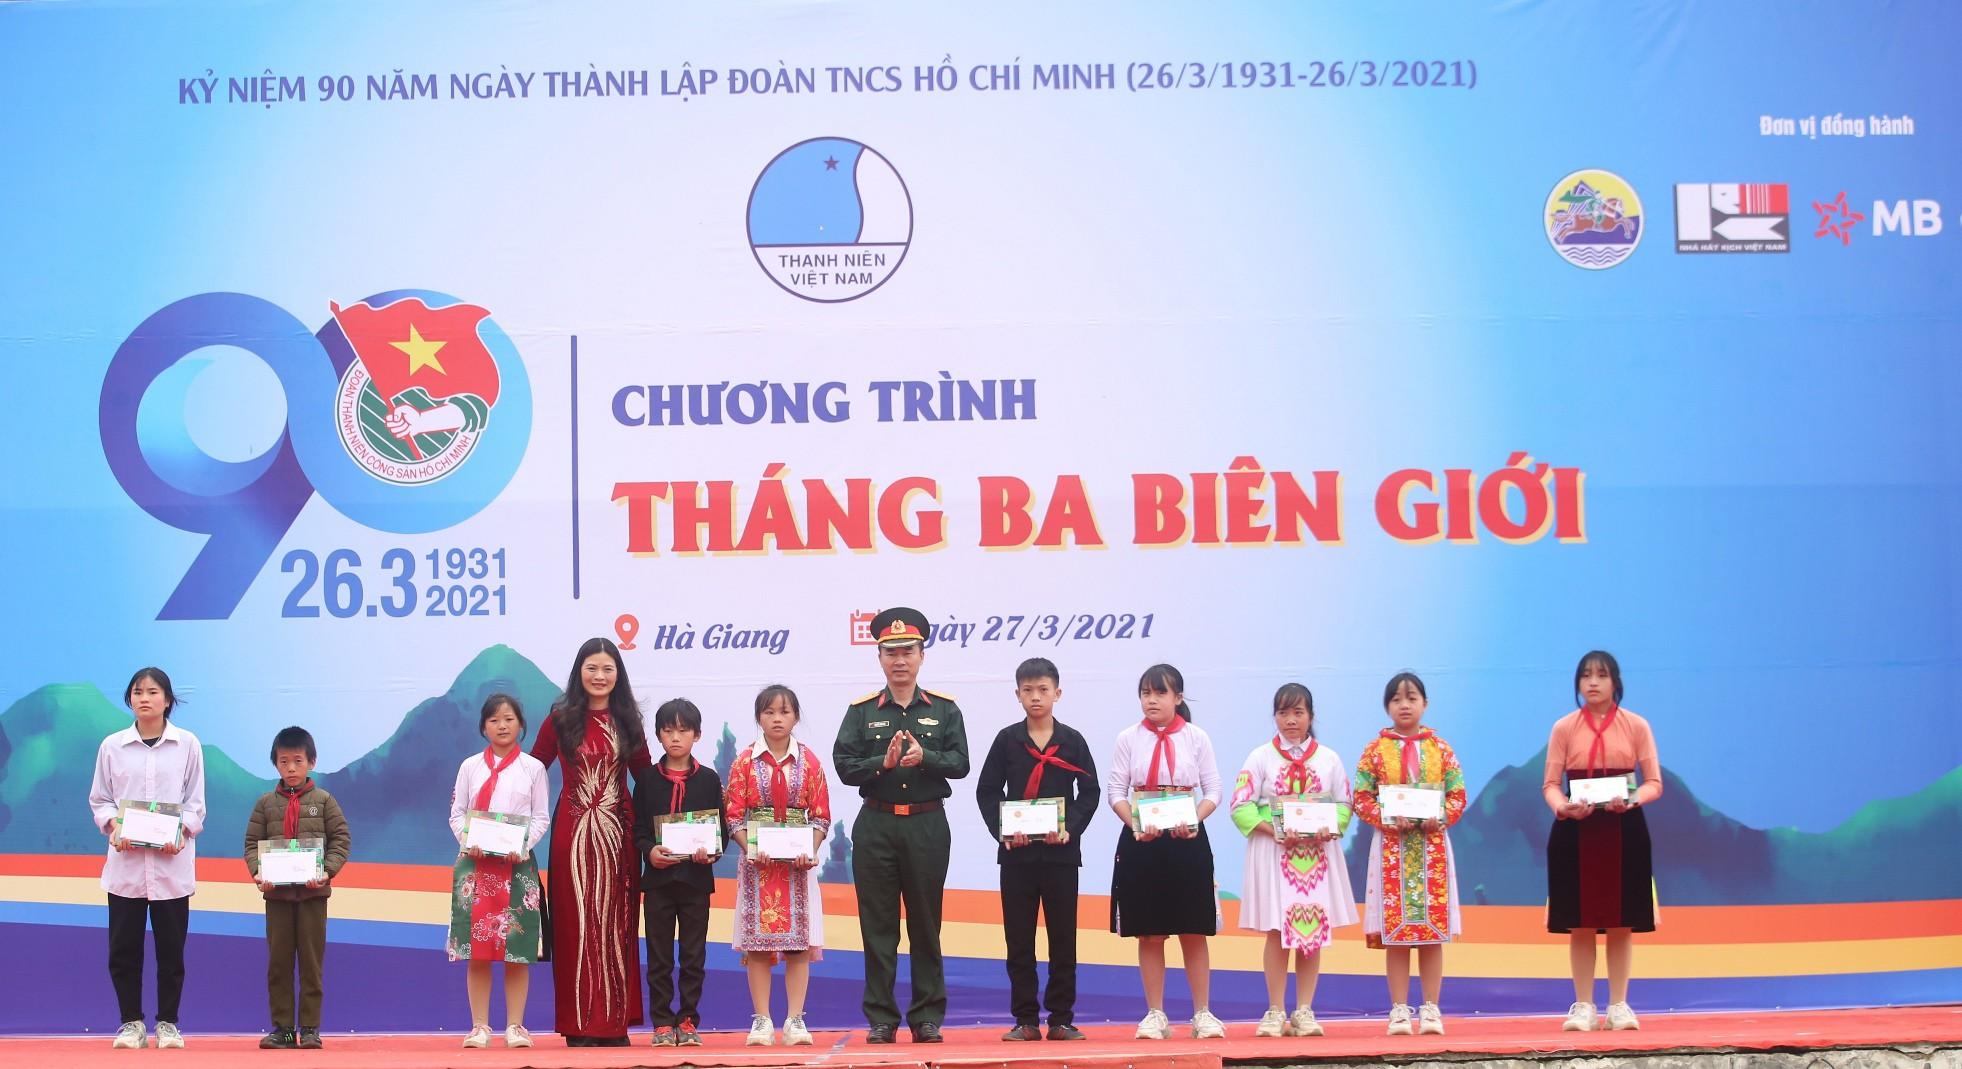 ngay-hoi-thanh-nien-dan-toc-va-chuong-trinh-thang-ba-bien-gioi-nam-2021-dulichvn-baodulich-tapchidulich-1616984774.JPG